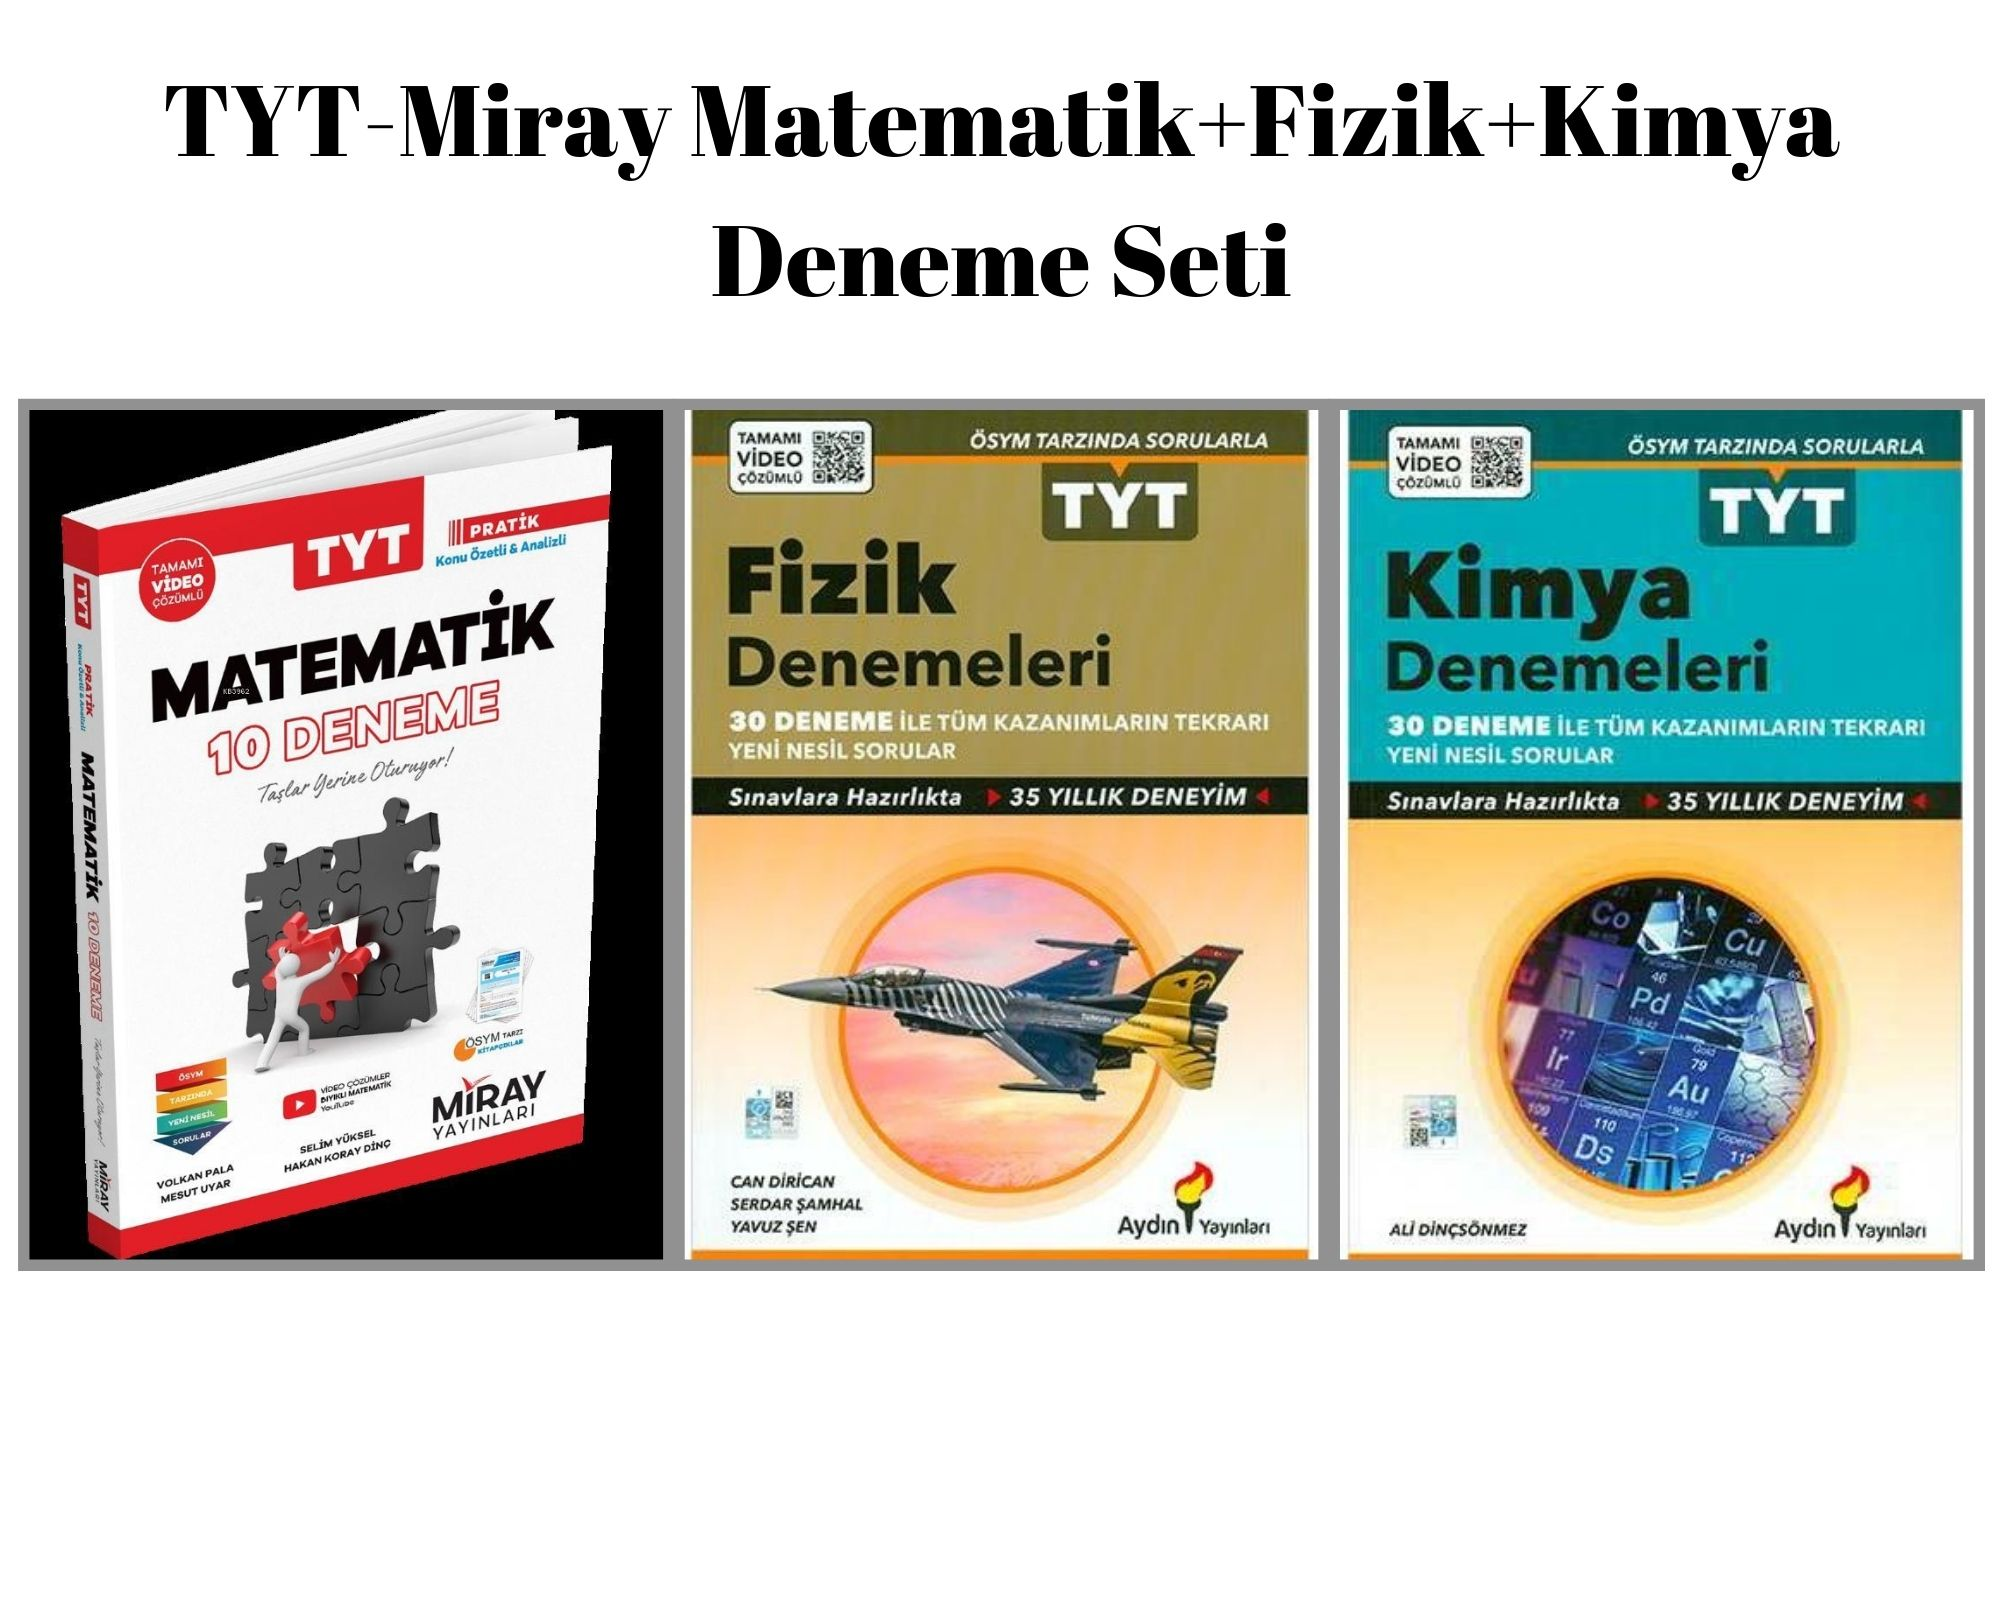 TYT-Miray Matematik+Fizik+Kimya Deneme Seti